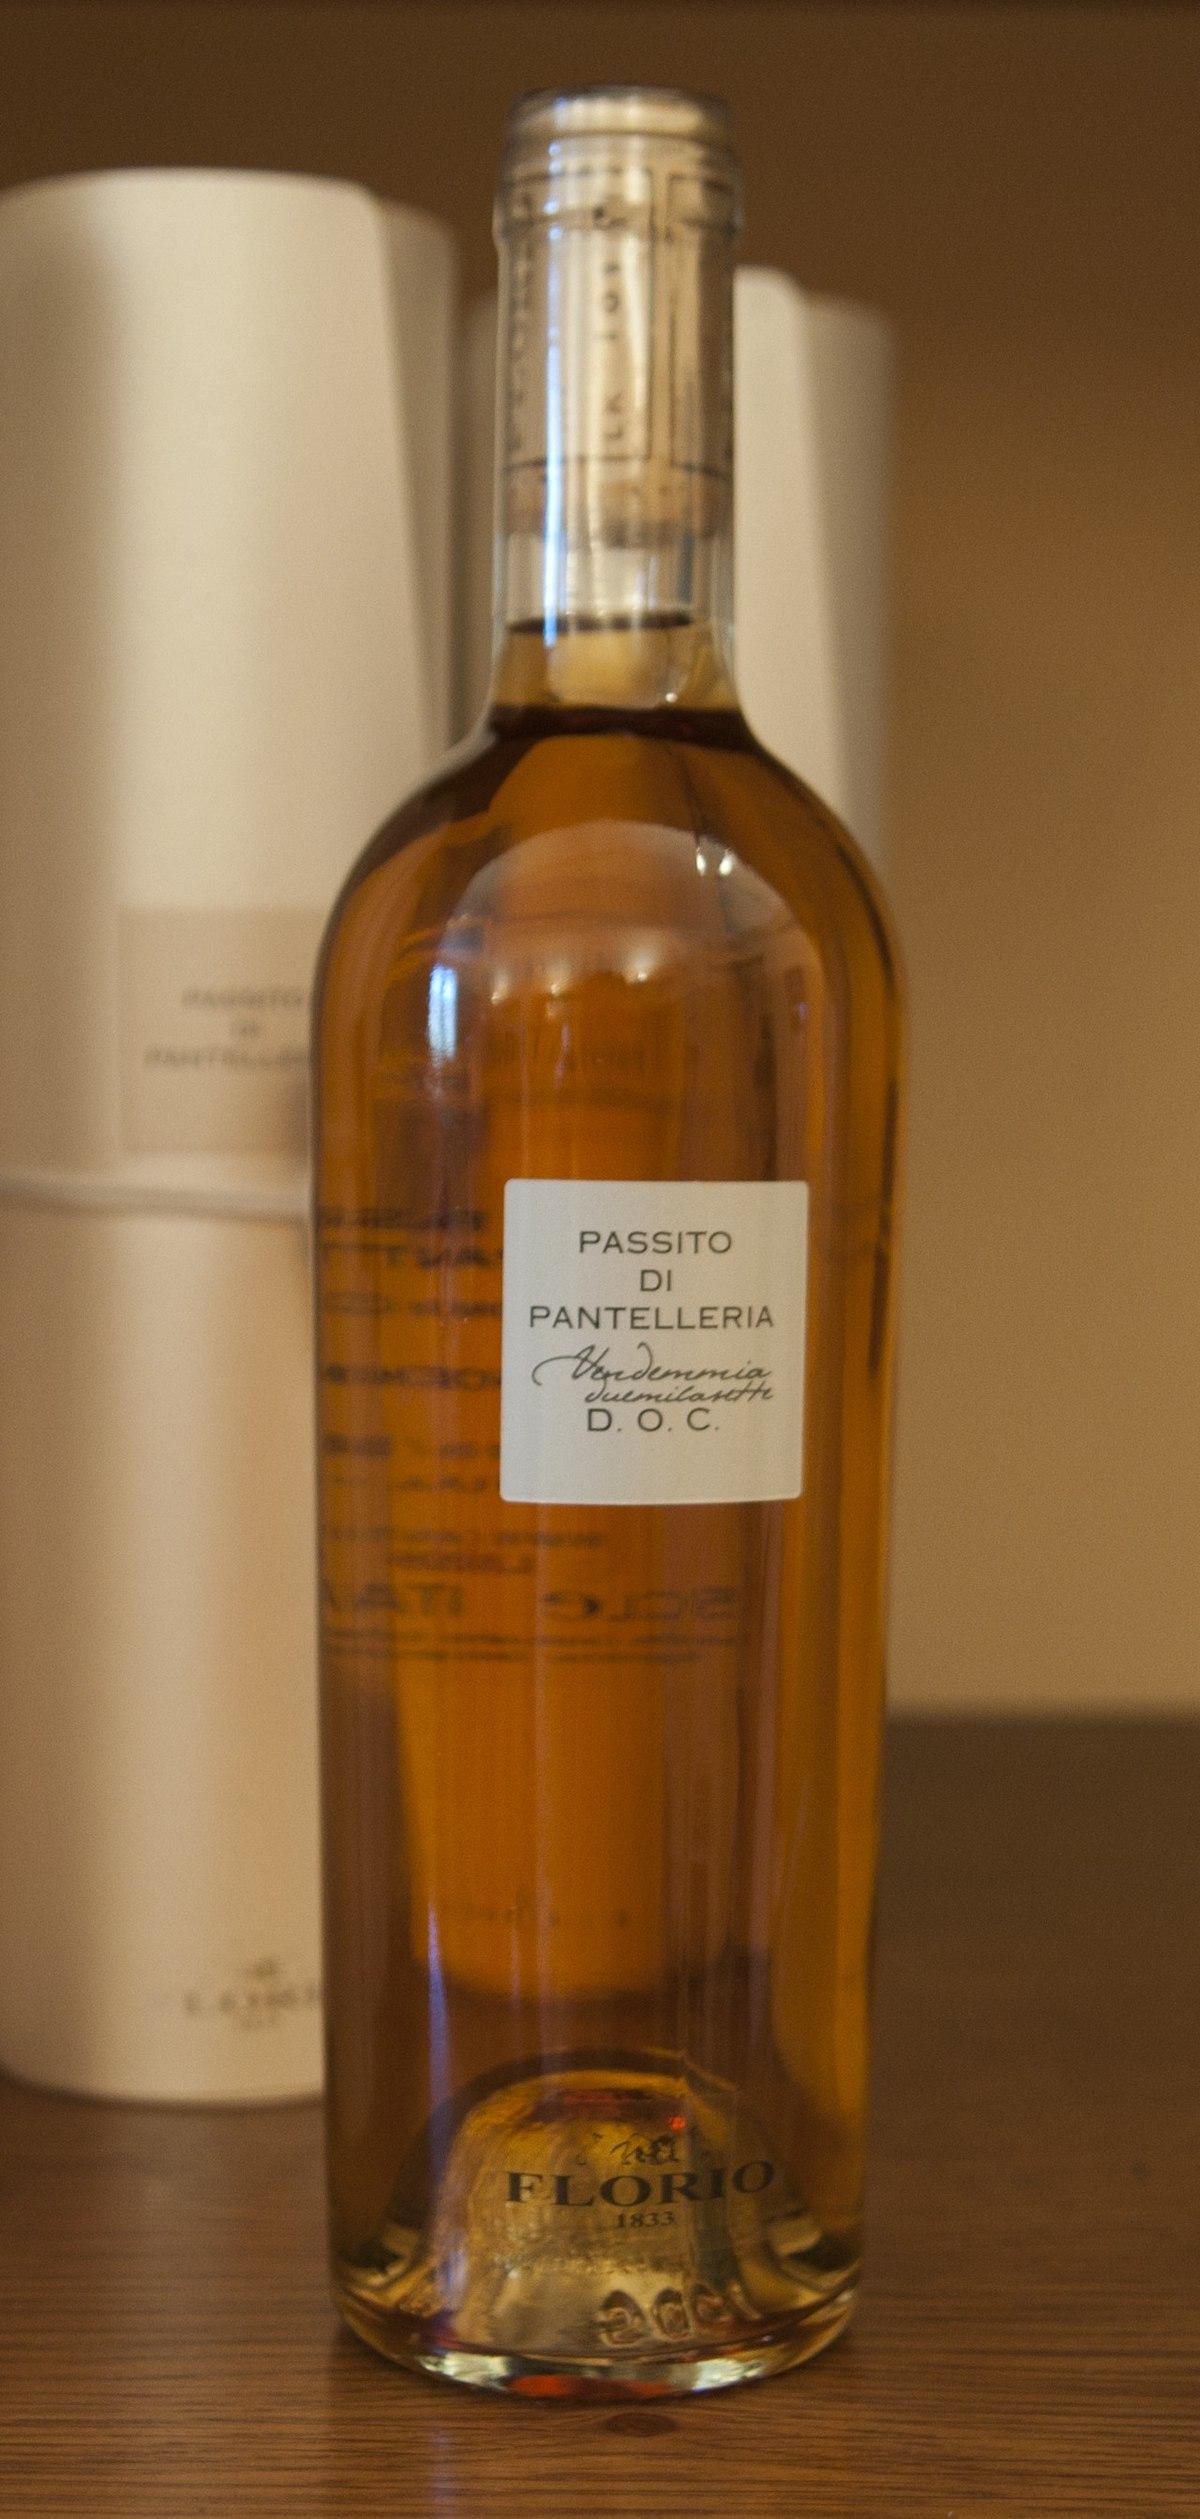 Image result for Passito di Pantelleria